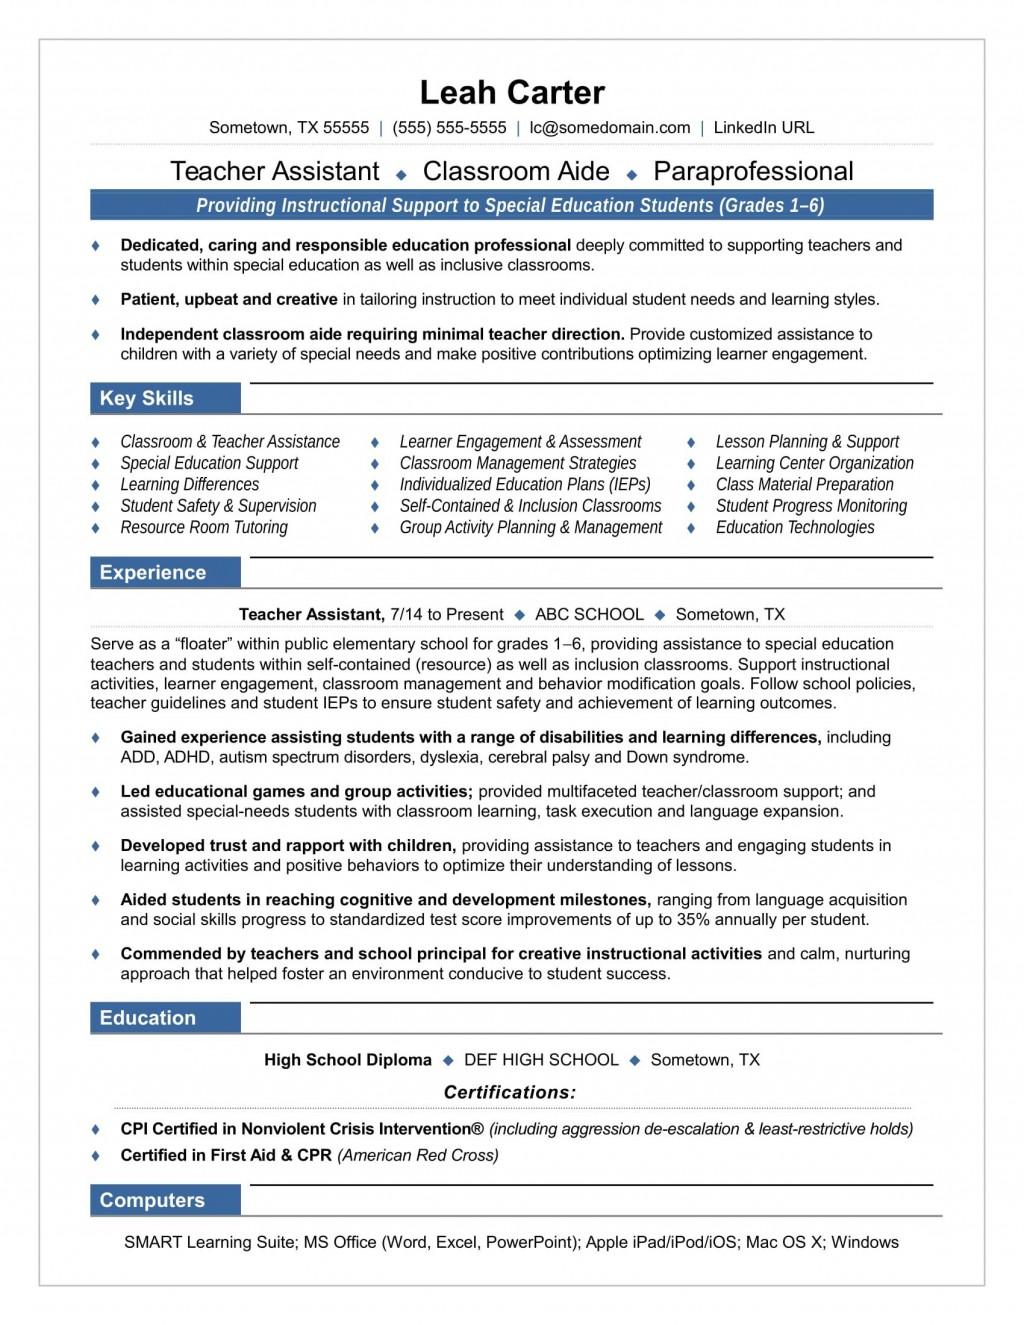 005 Sensational Resume Template For Teaching Job Highest Clarity  Sample Cv In India Format Example TeacherLarge